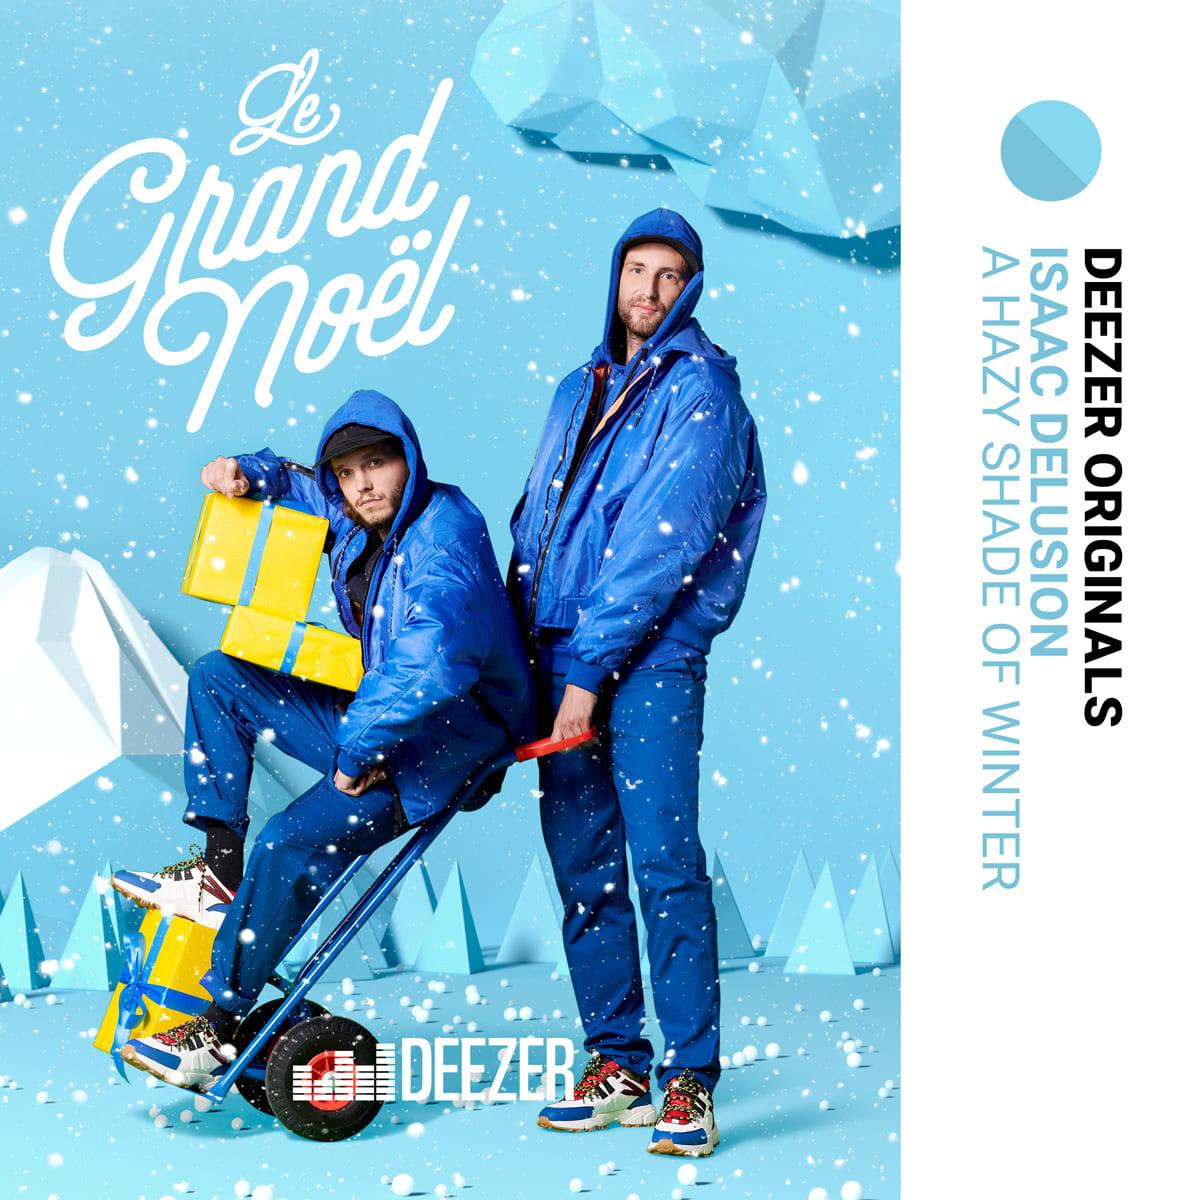 DEEZER_Le_Grand_Noel_Cover_Isaac-Dellusion_27265